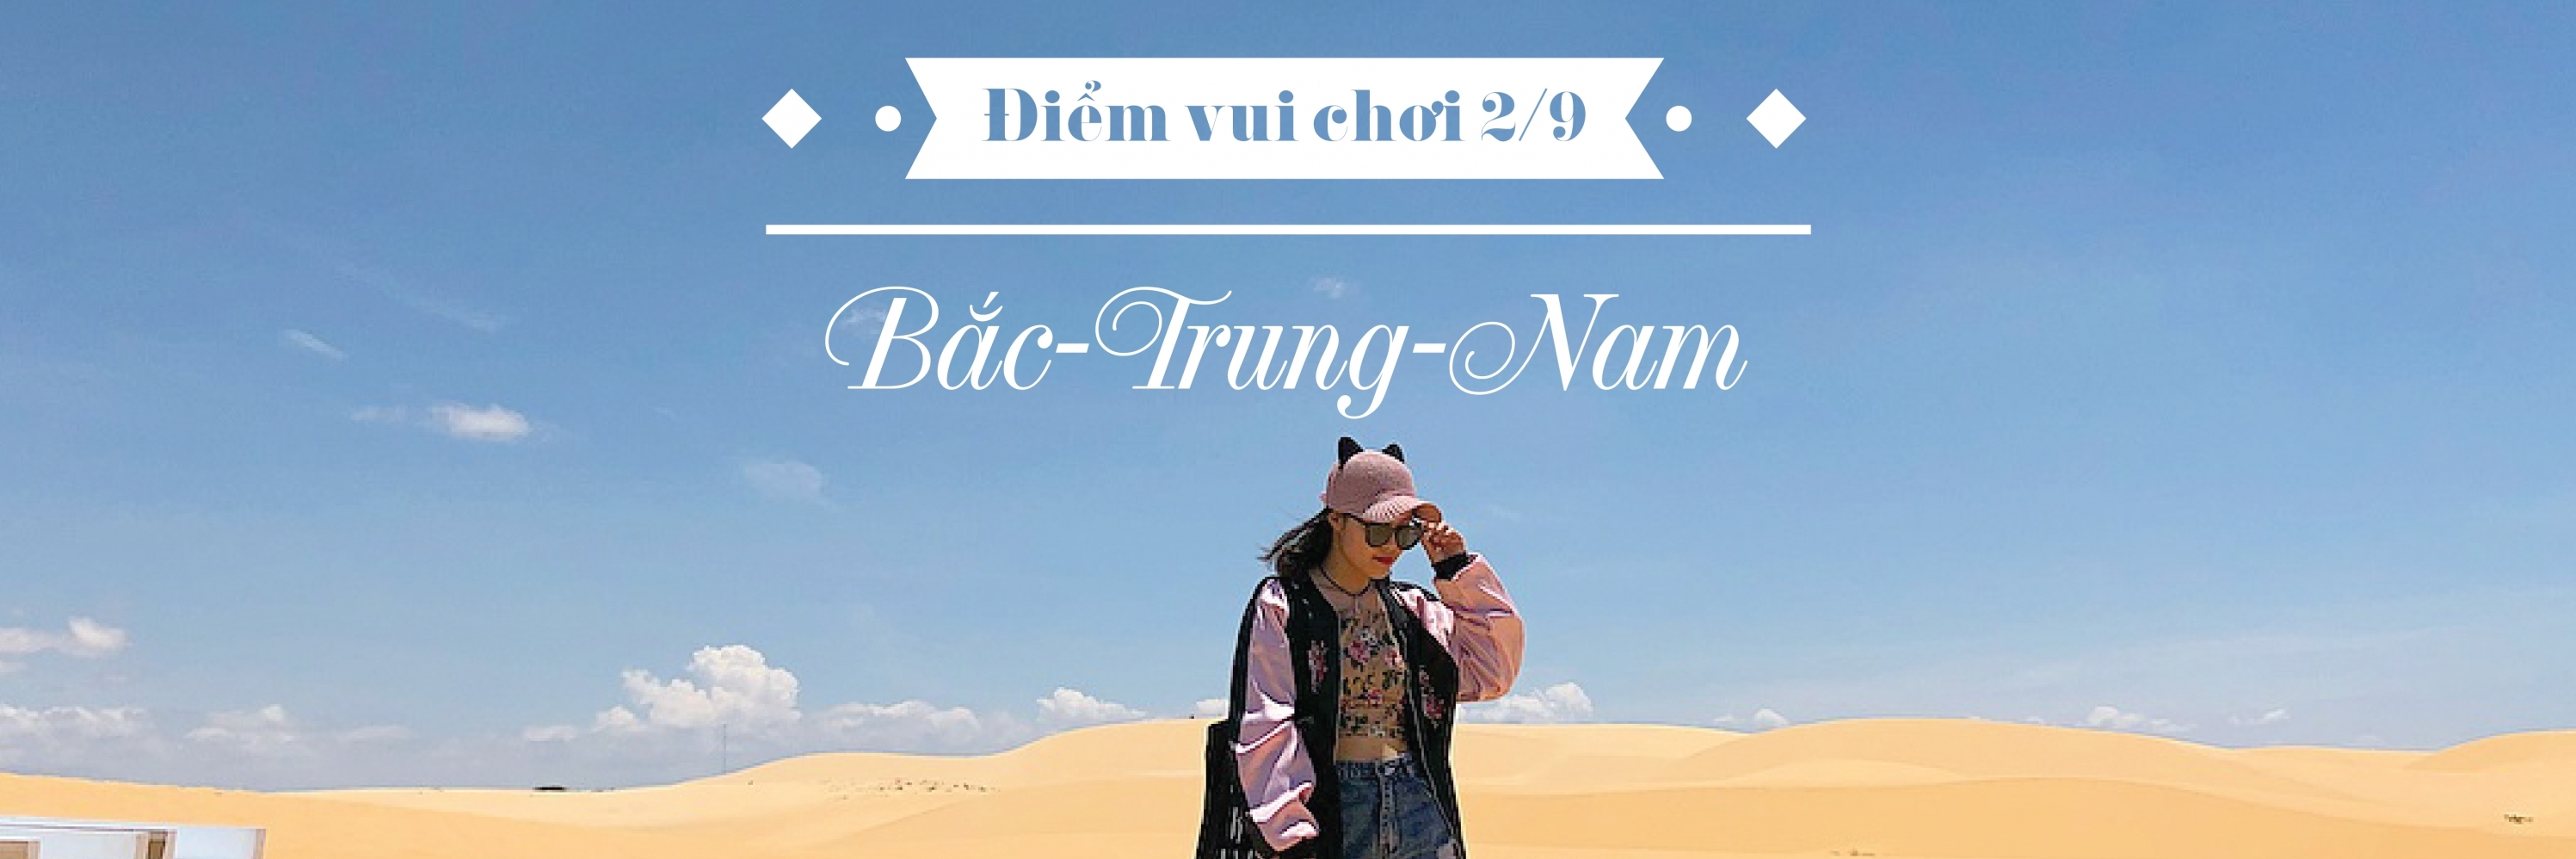 https://gody.vn/blog/gody1.vn6365/post/lat-tung-tat-tan-tat-diem-vui-choi-le-29-danh-cho-team-3-mien-798